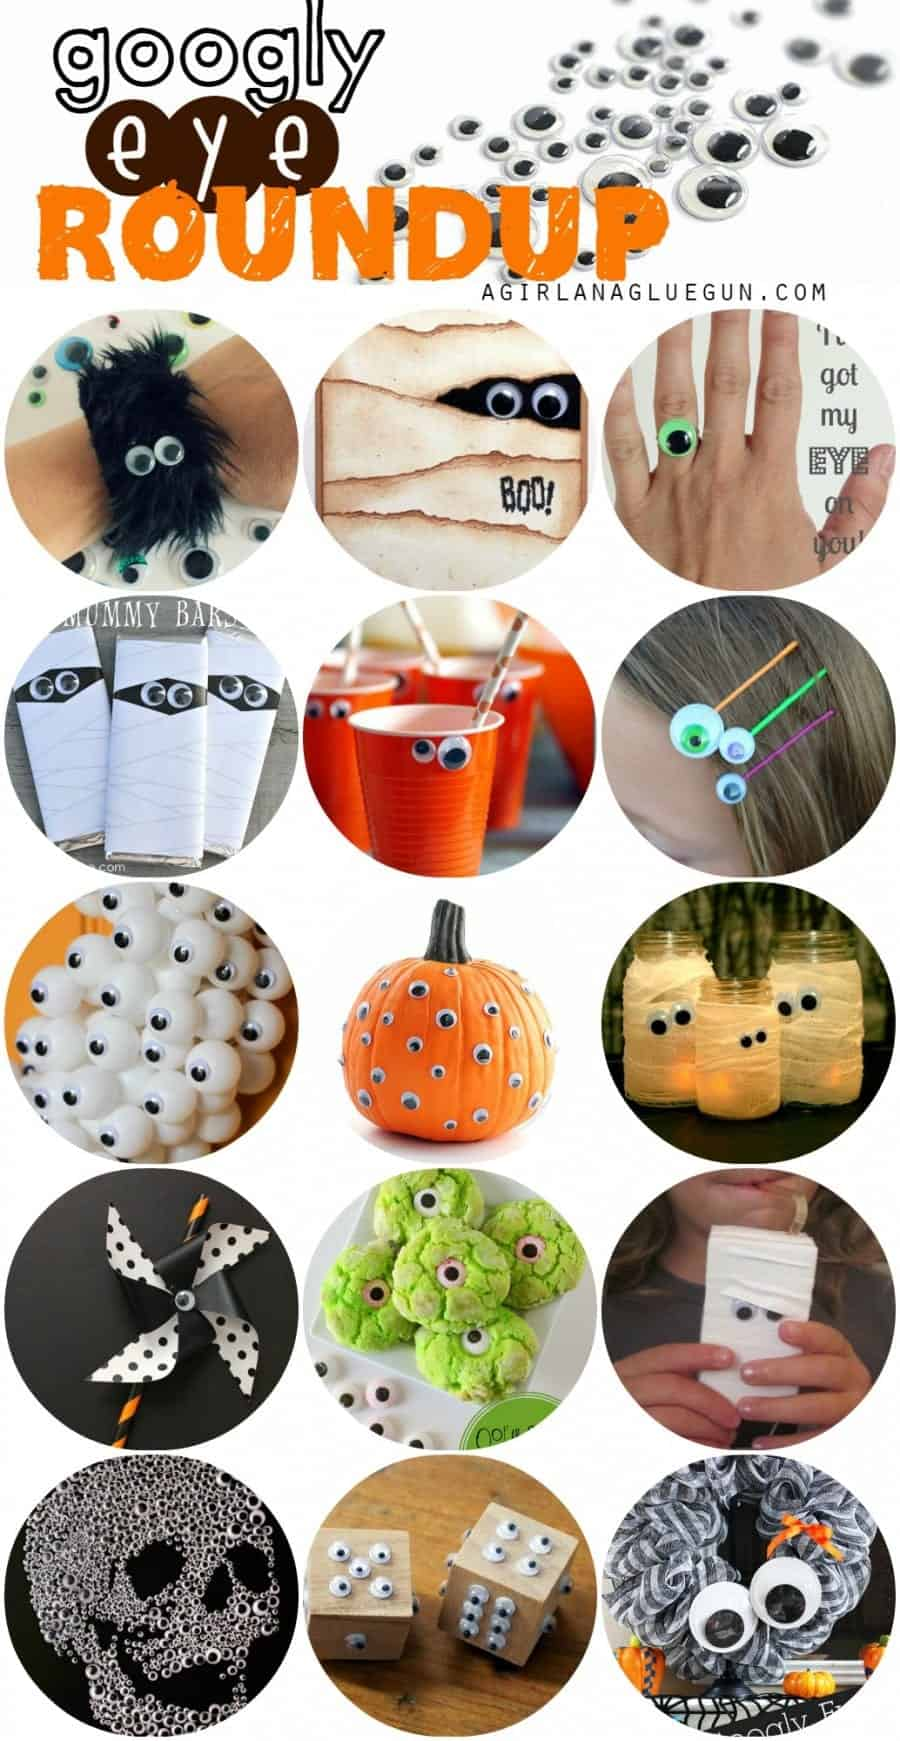 googly eye roundup--25 fun crafts to make for halloween